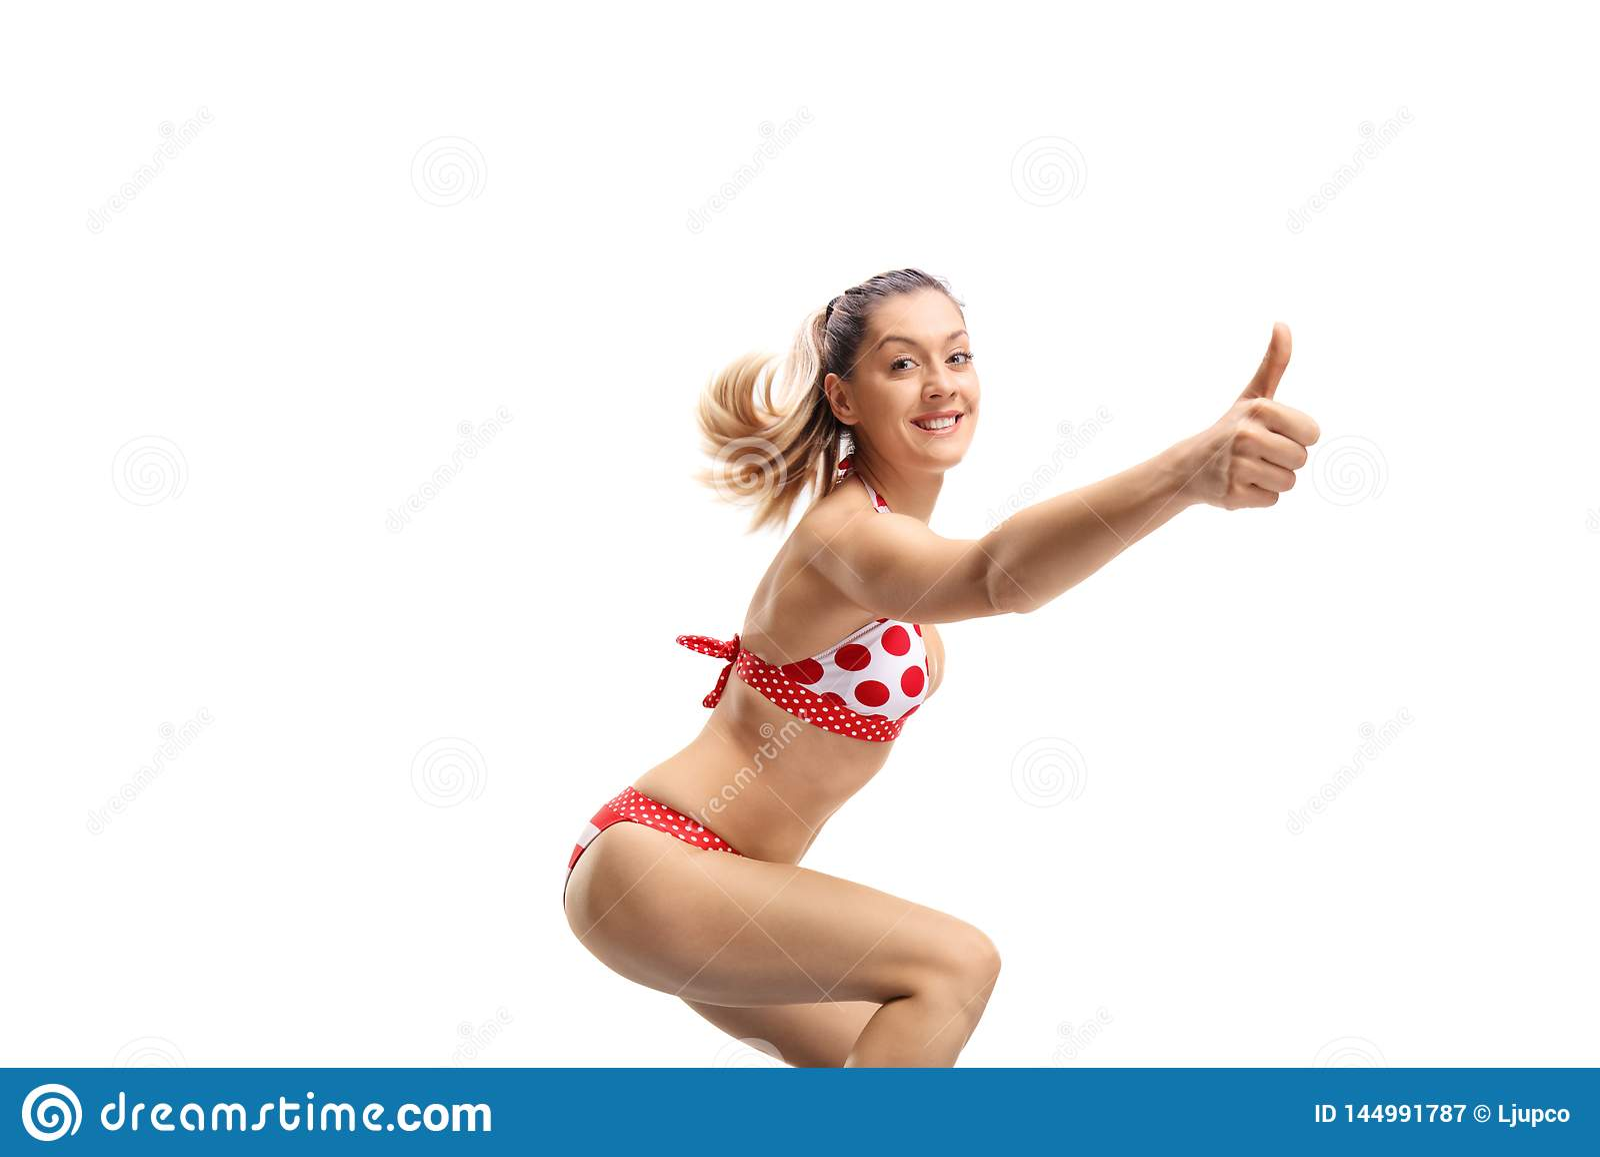 Cheerful young woman in bikini making a thumb up gesture